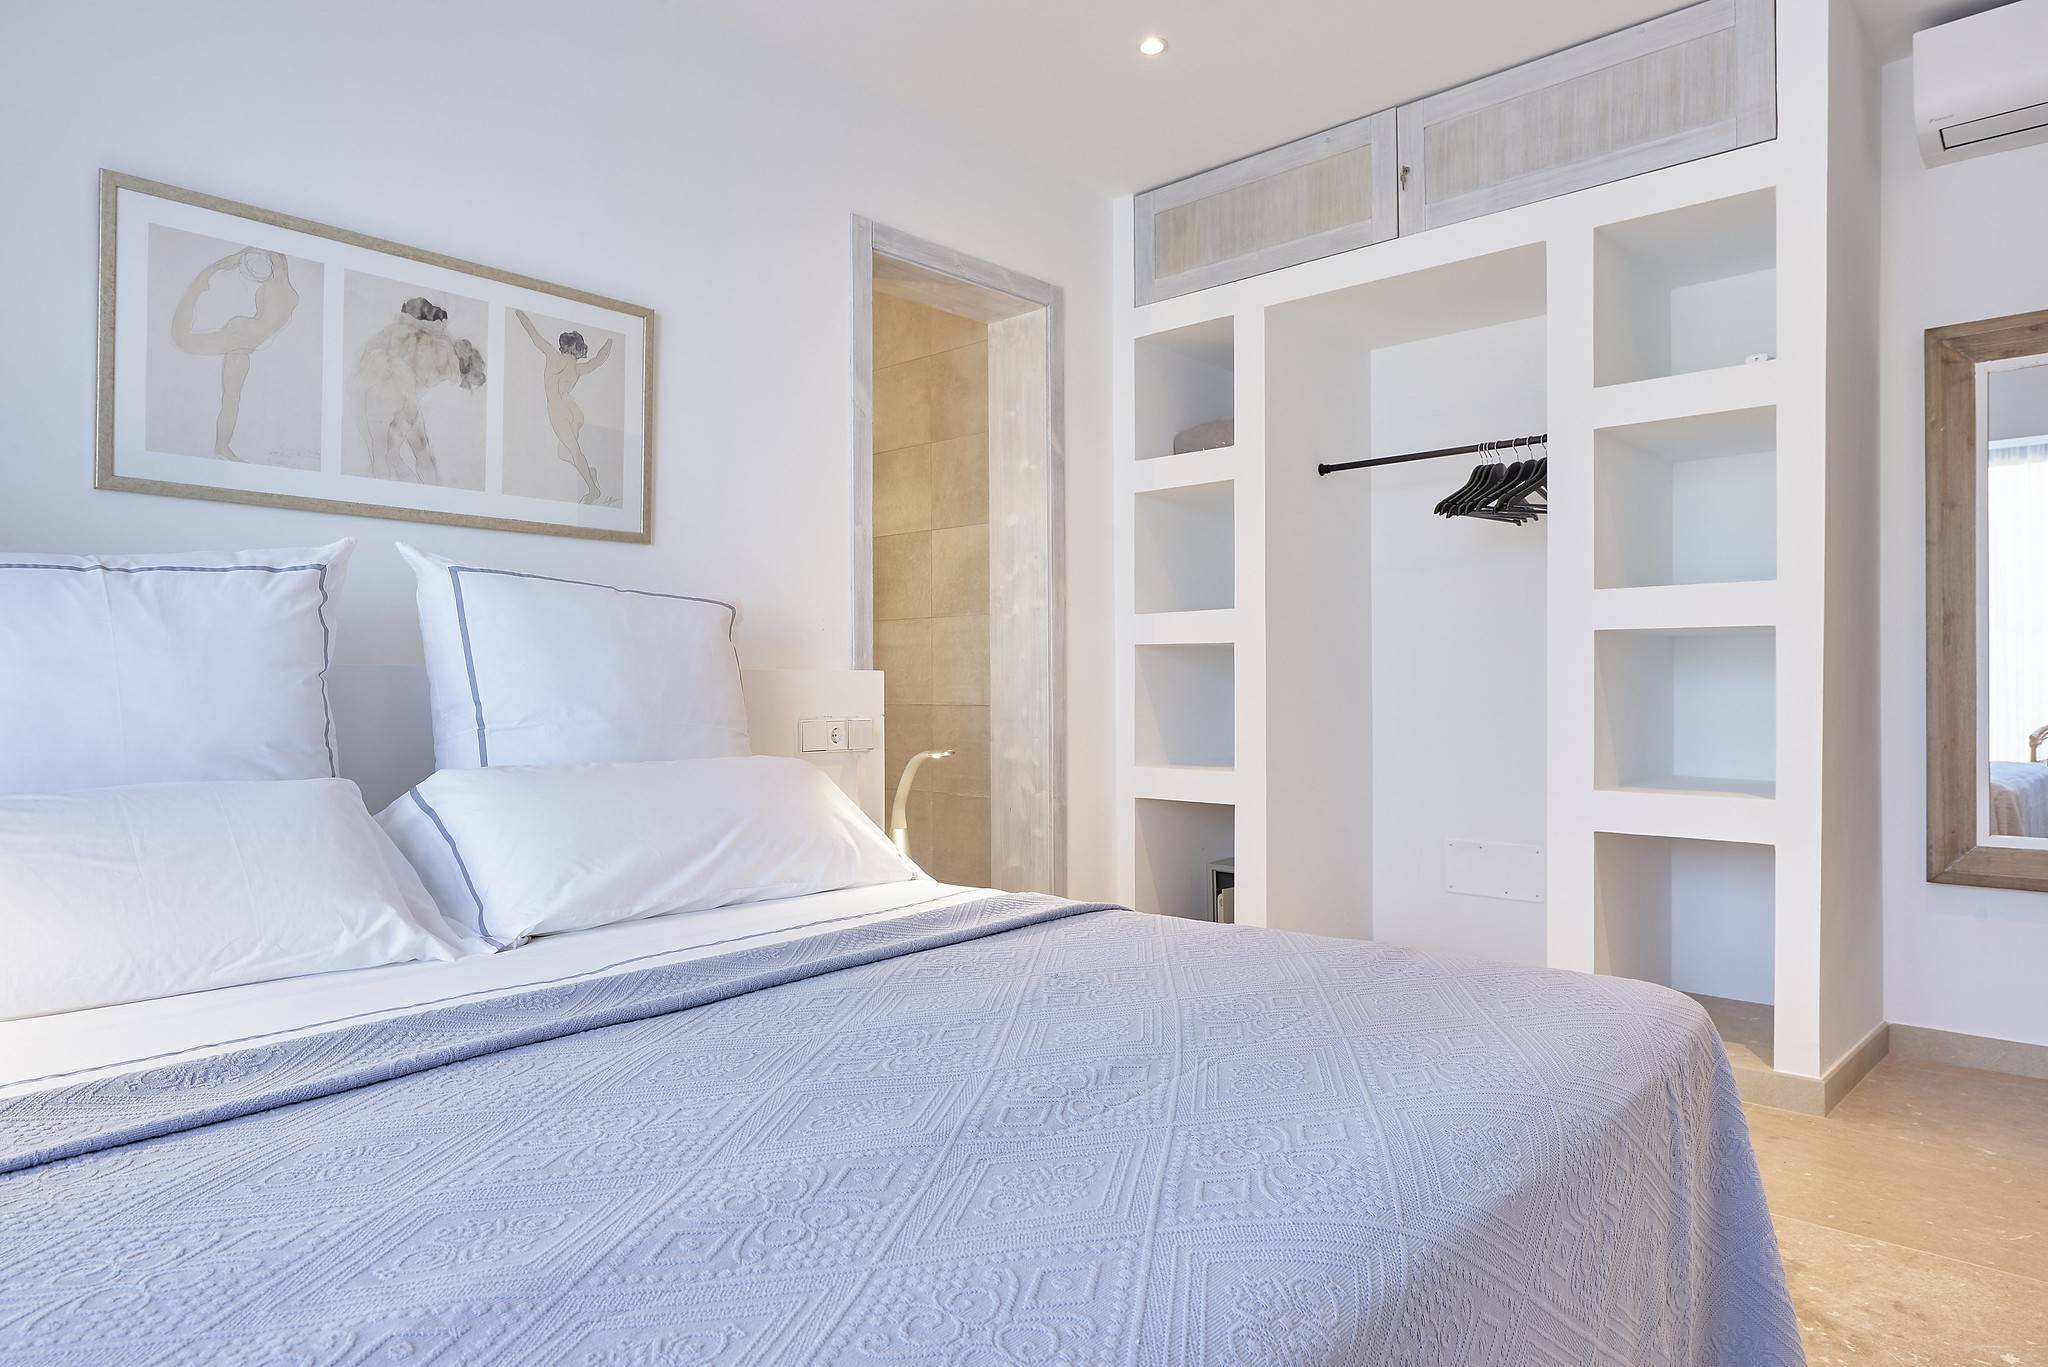 https://www.white-ibiza.com/wp-content/uploads/2020/06/white-ibiza-villas-sa-serra-interior-bedroom7.jpg